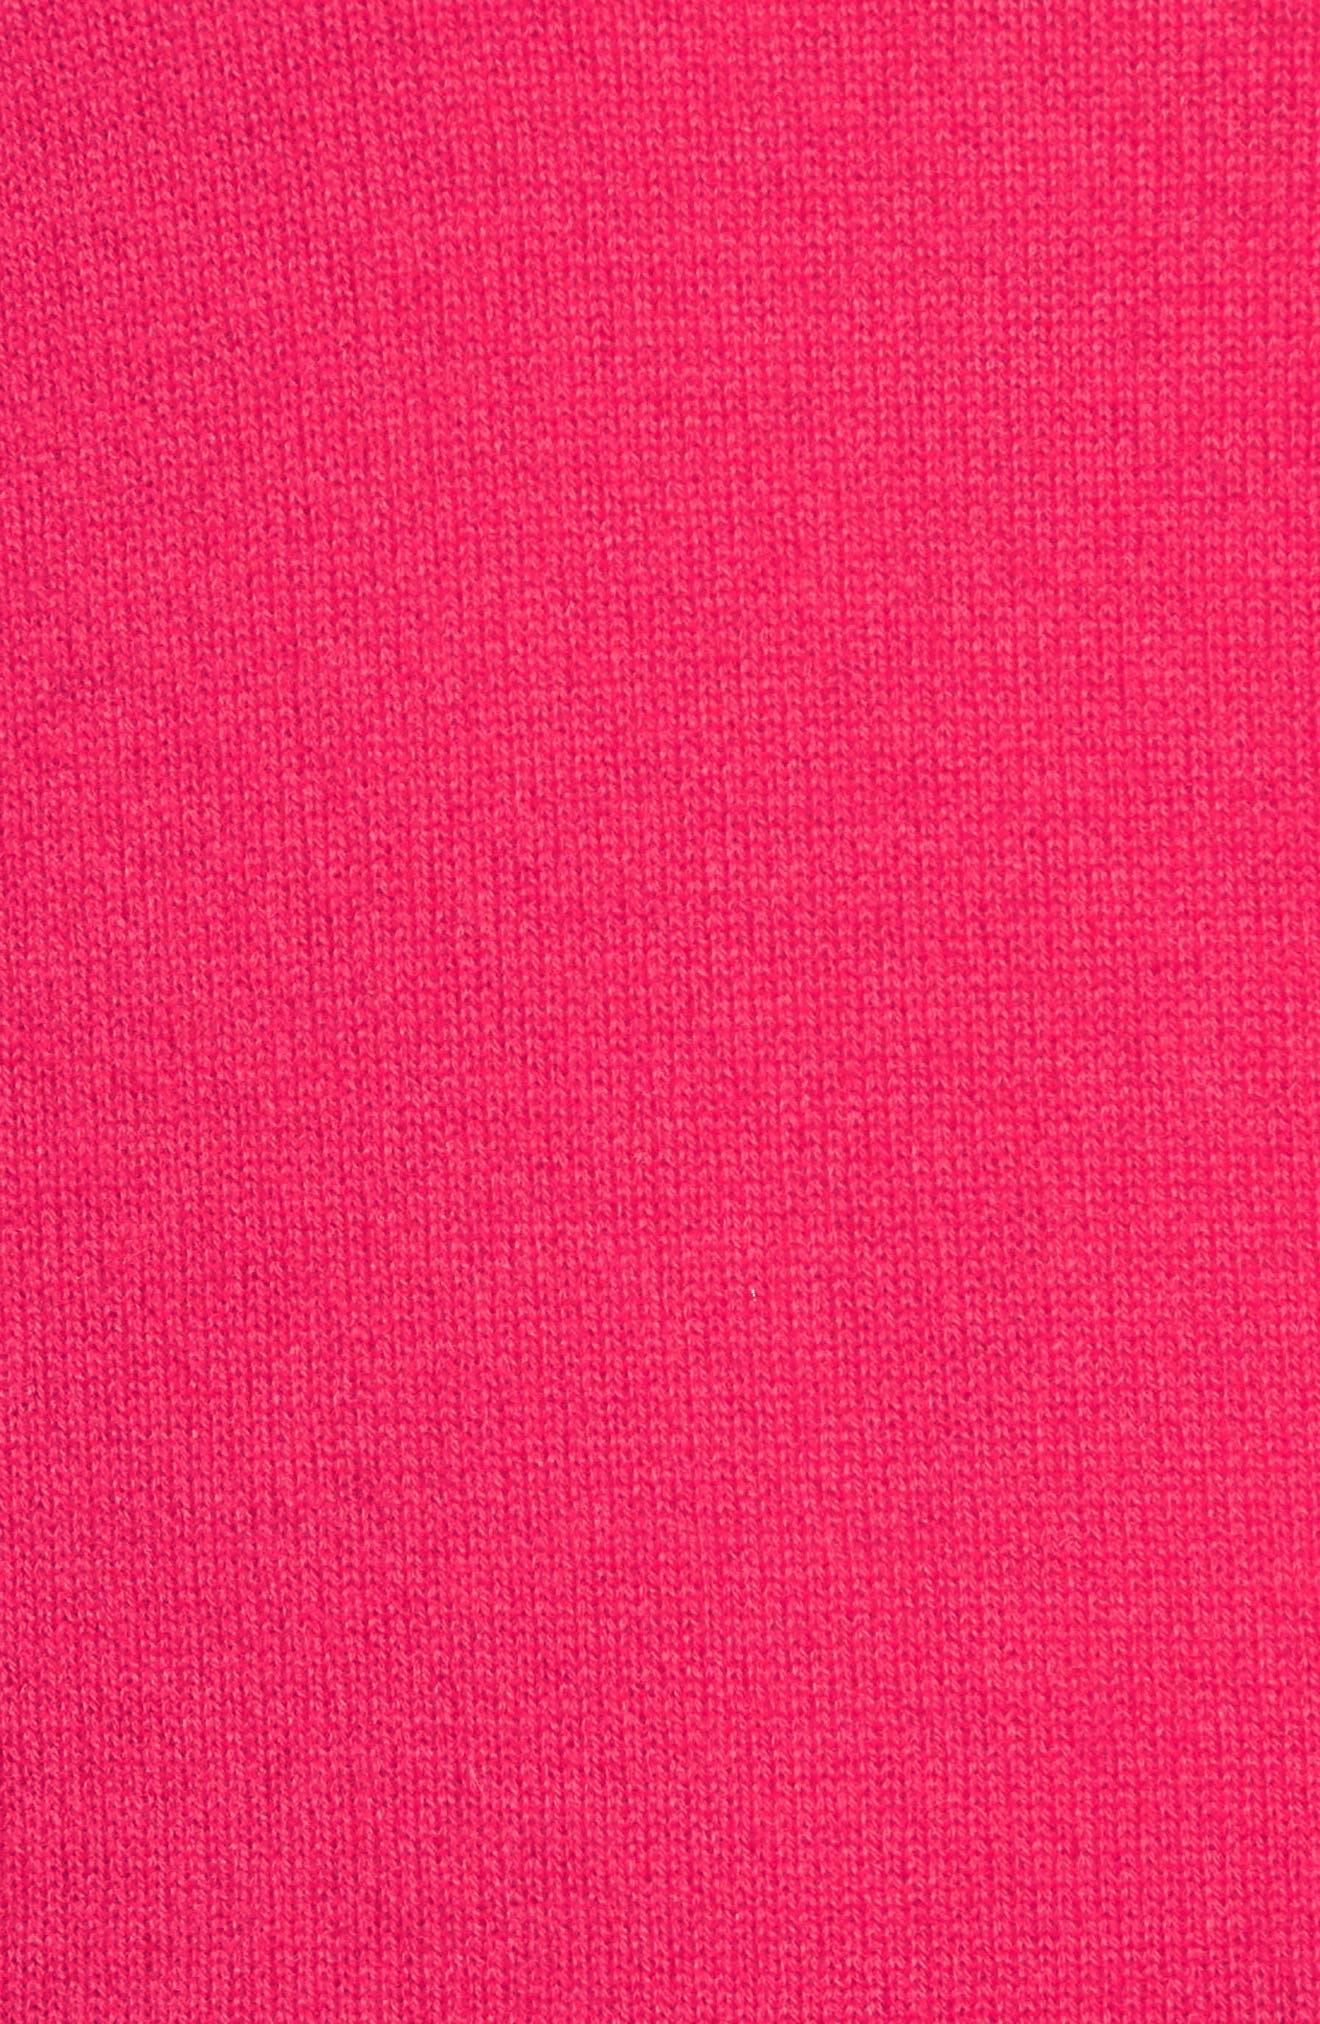 ,                             V-Neck Cashmere Sweater,                             Alternate thumbnail 63, color,                             651